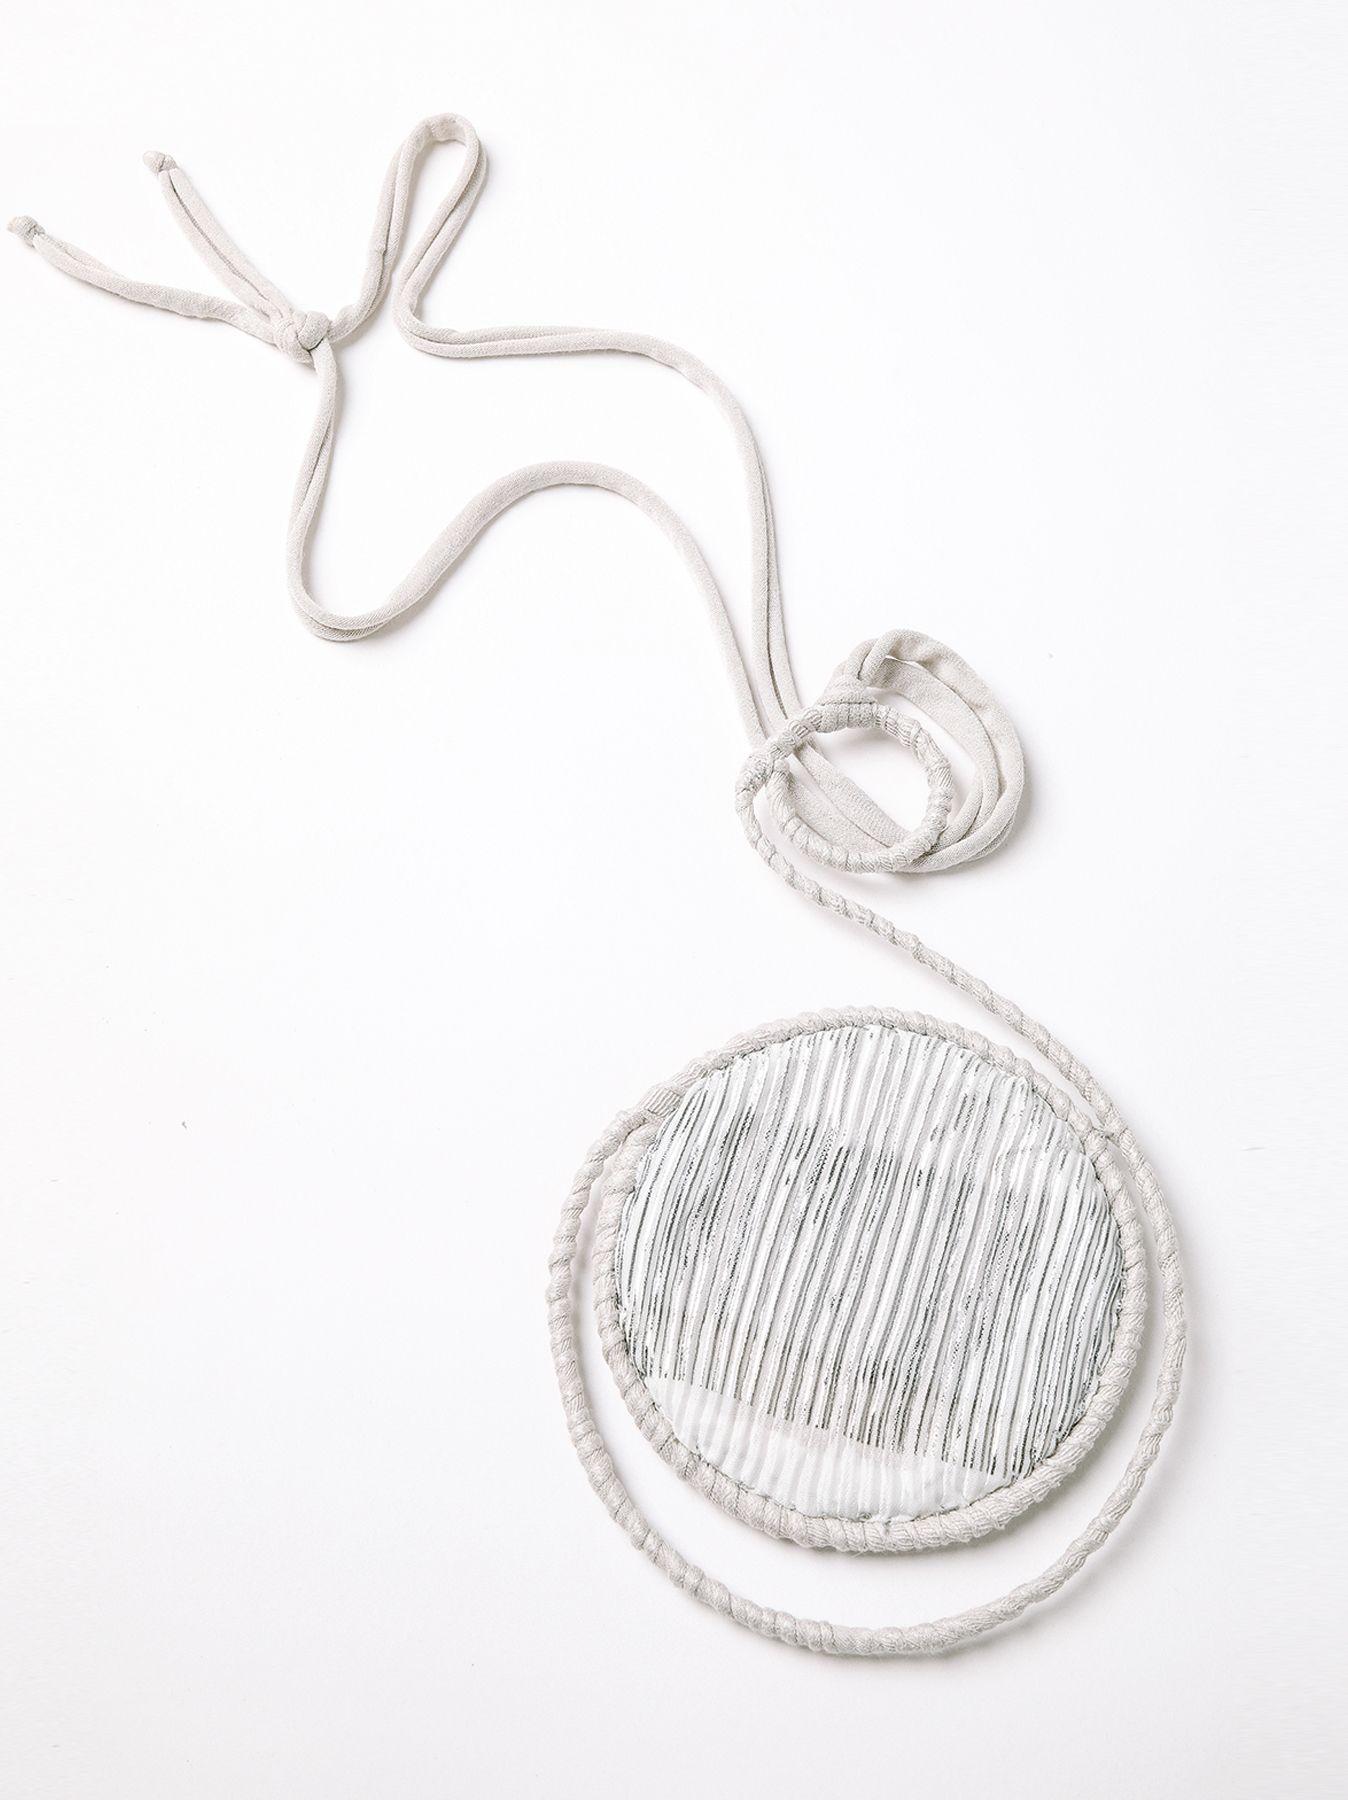 Collar circular plisado